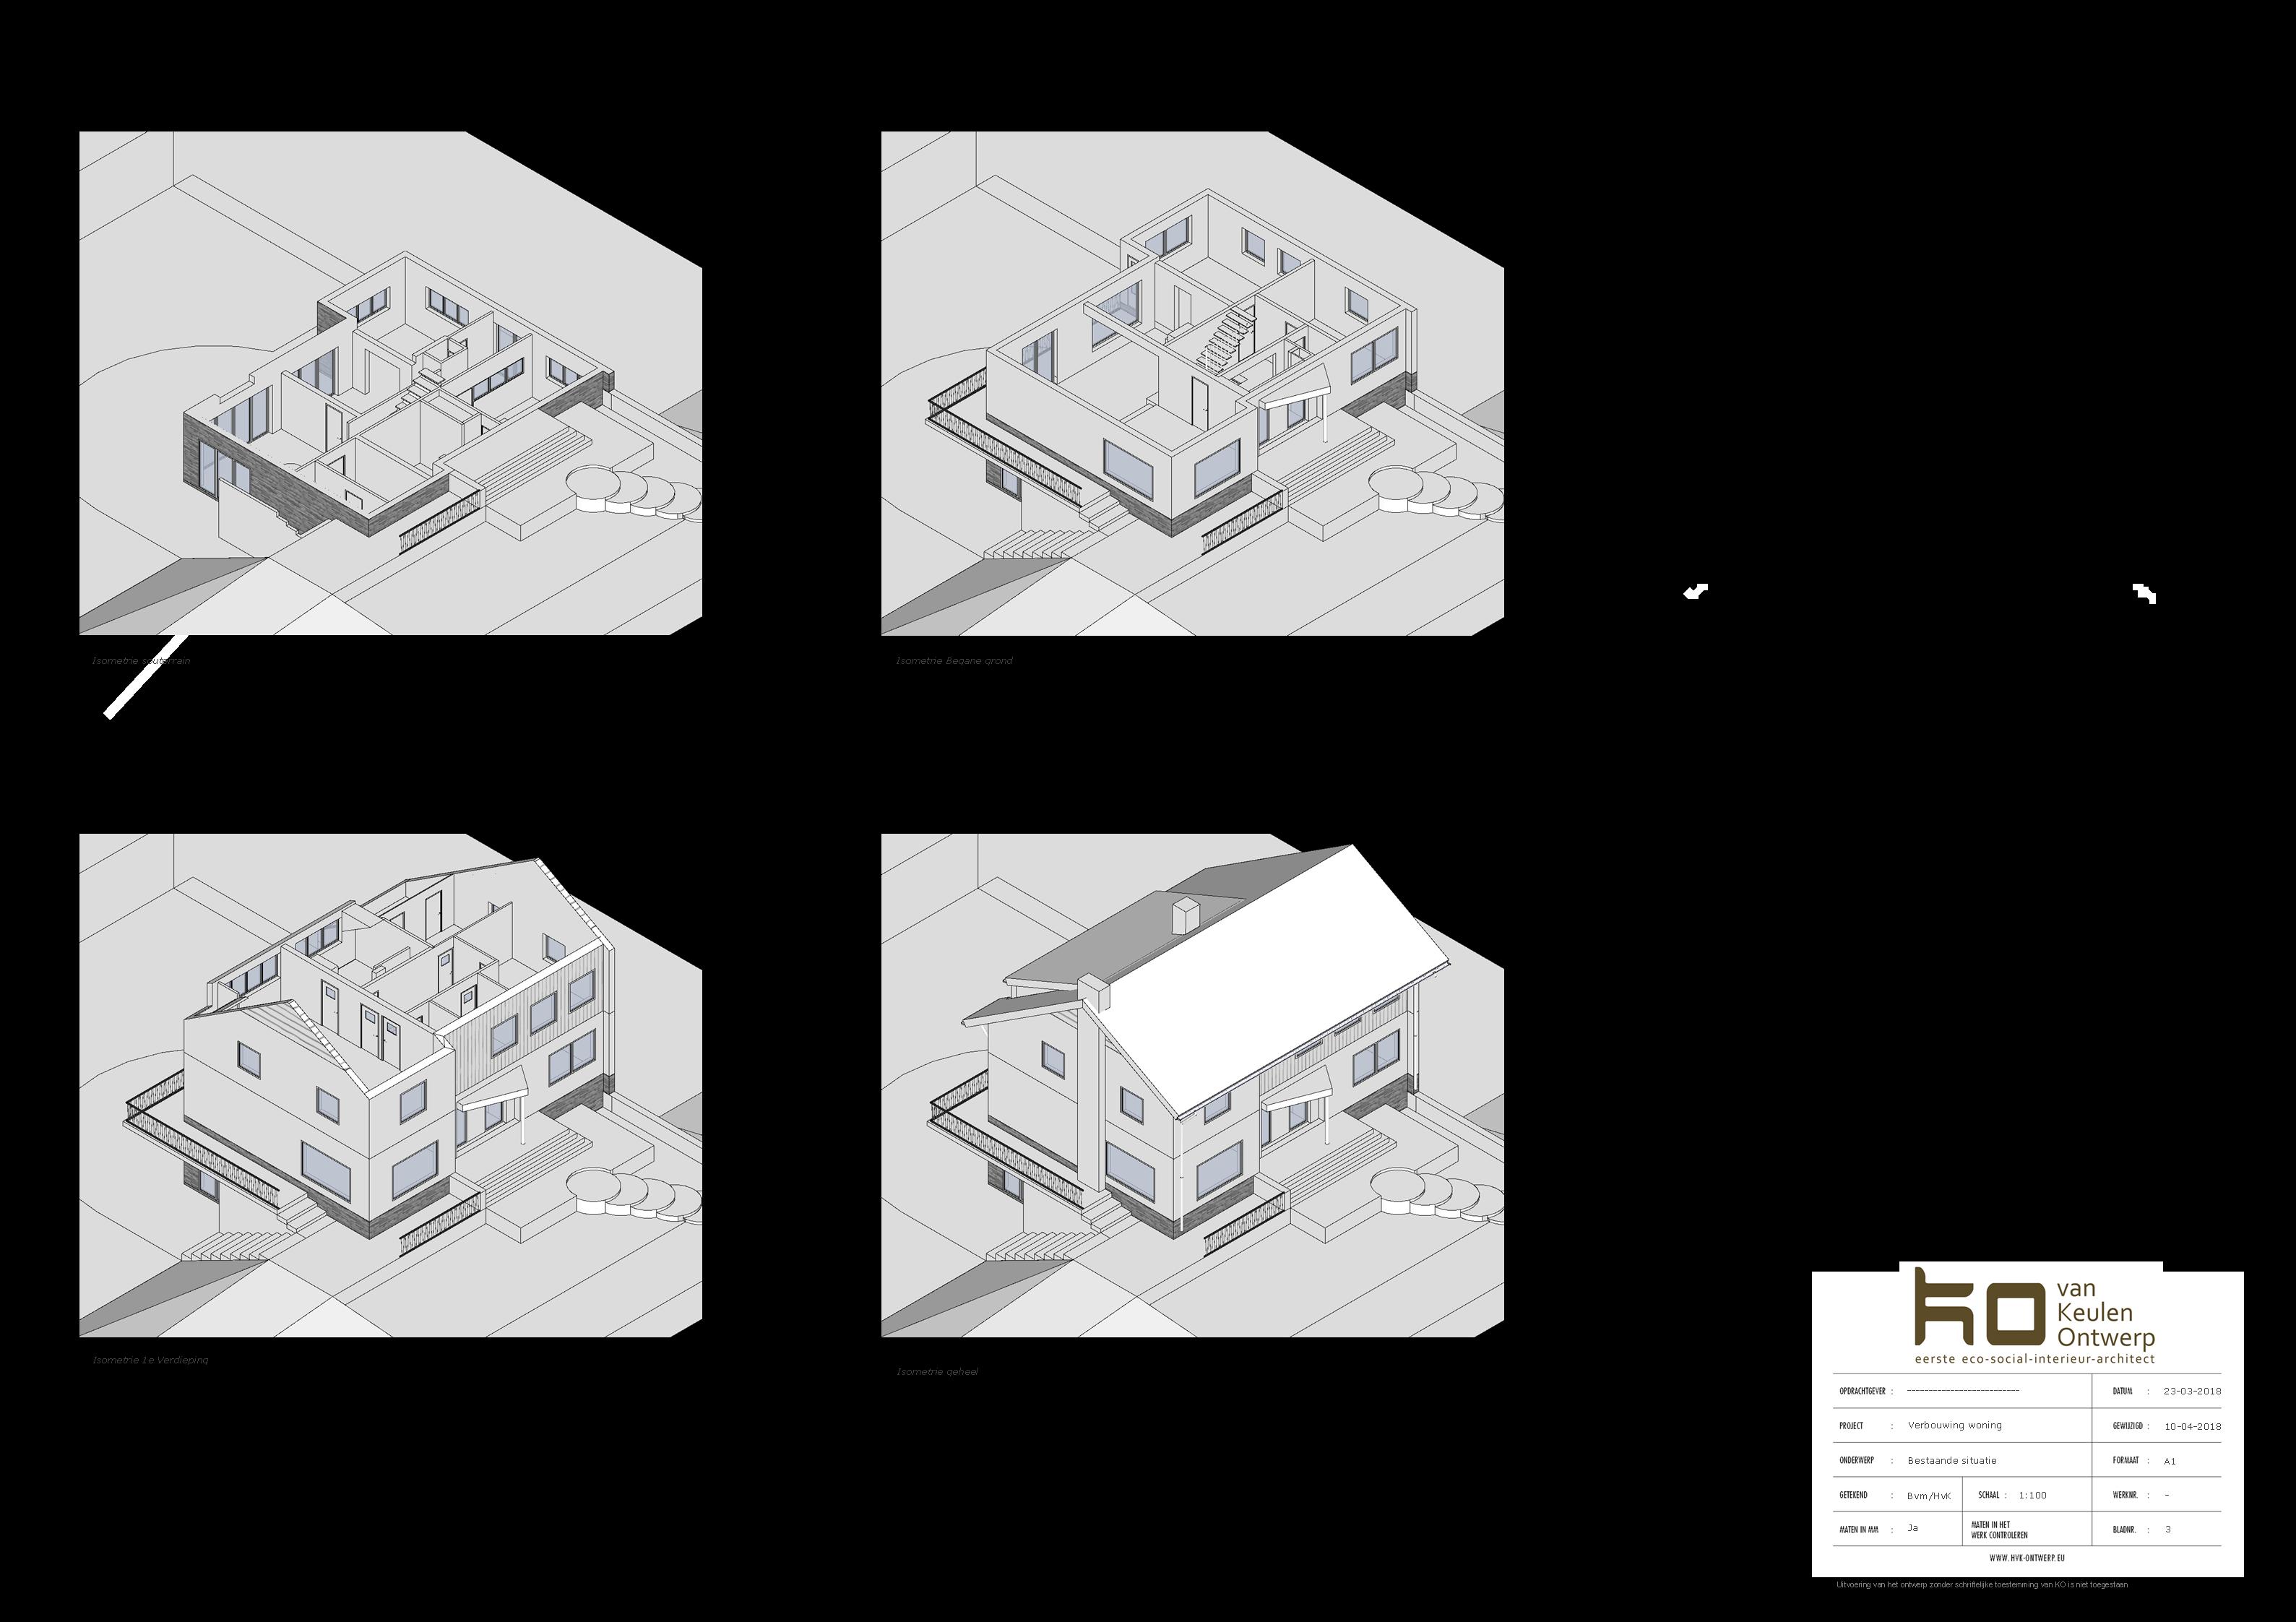 20180412 VO KO- -RT 10118 Huissen SITE_03